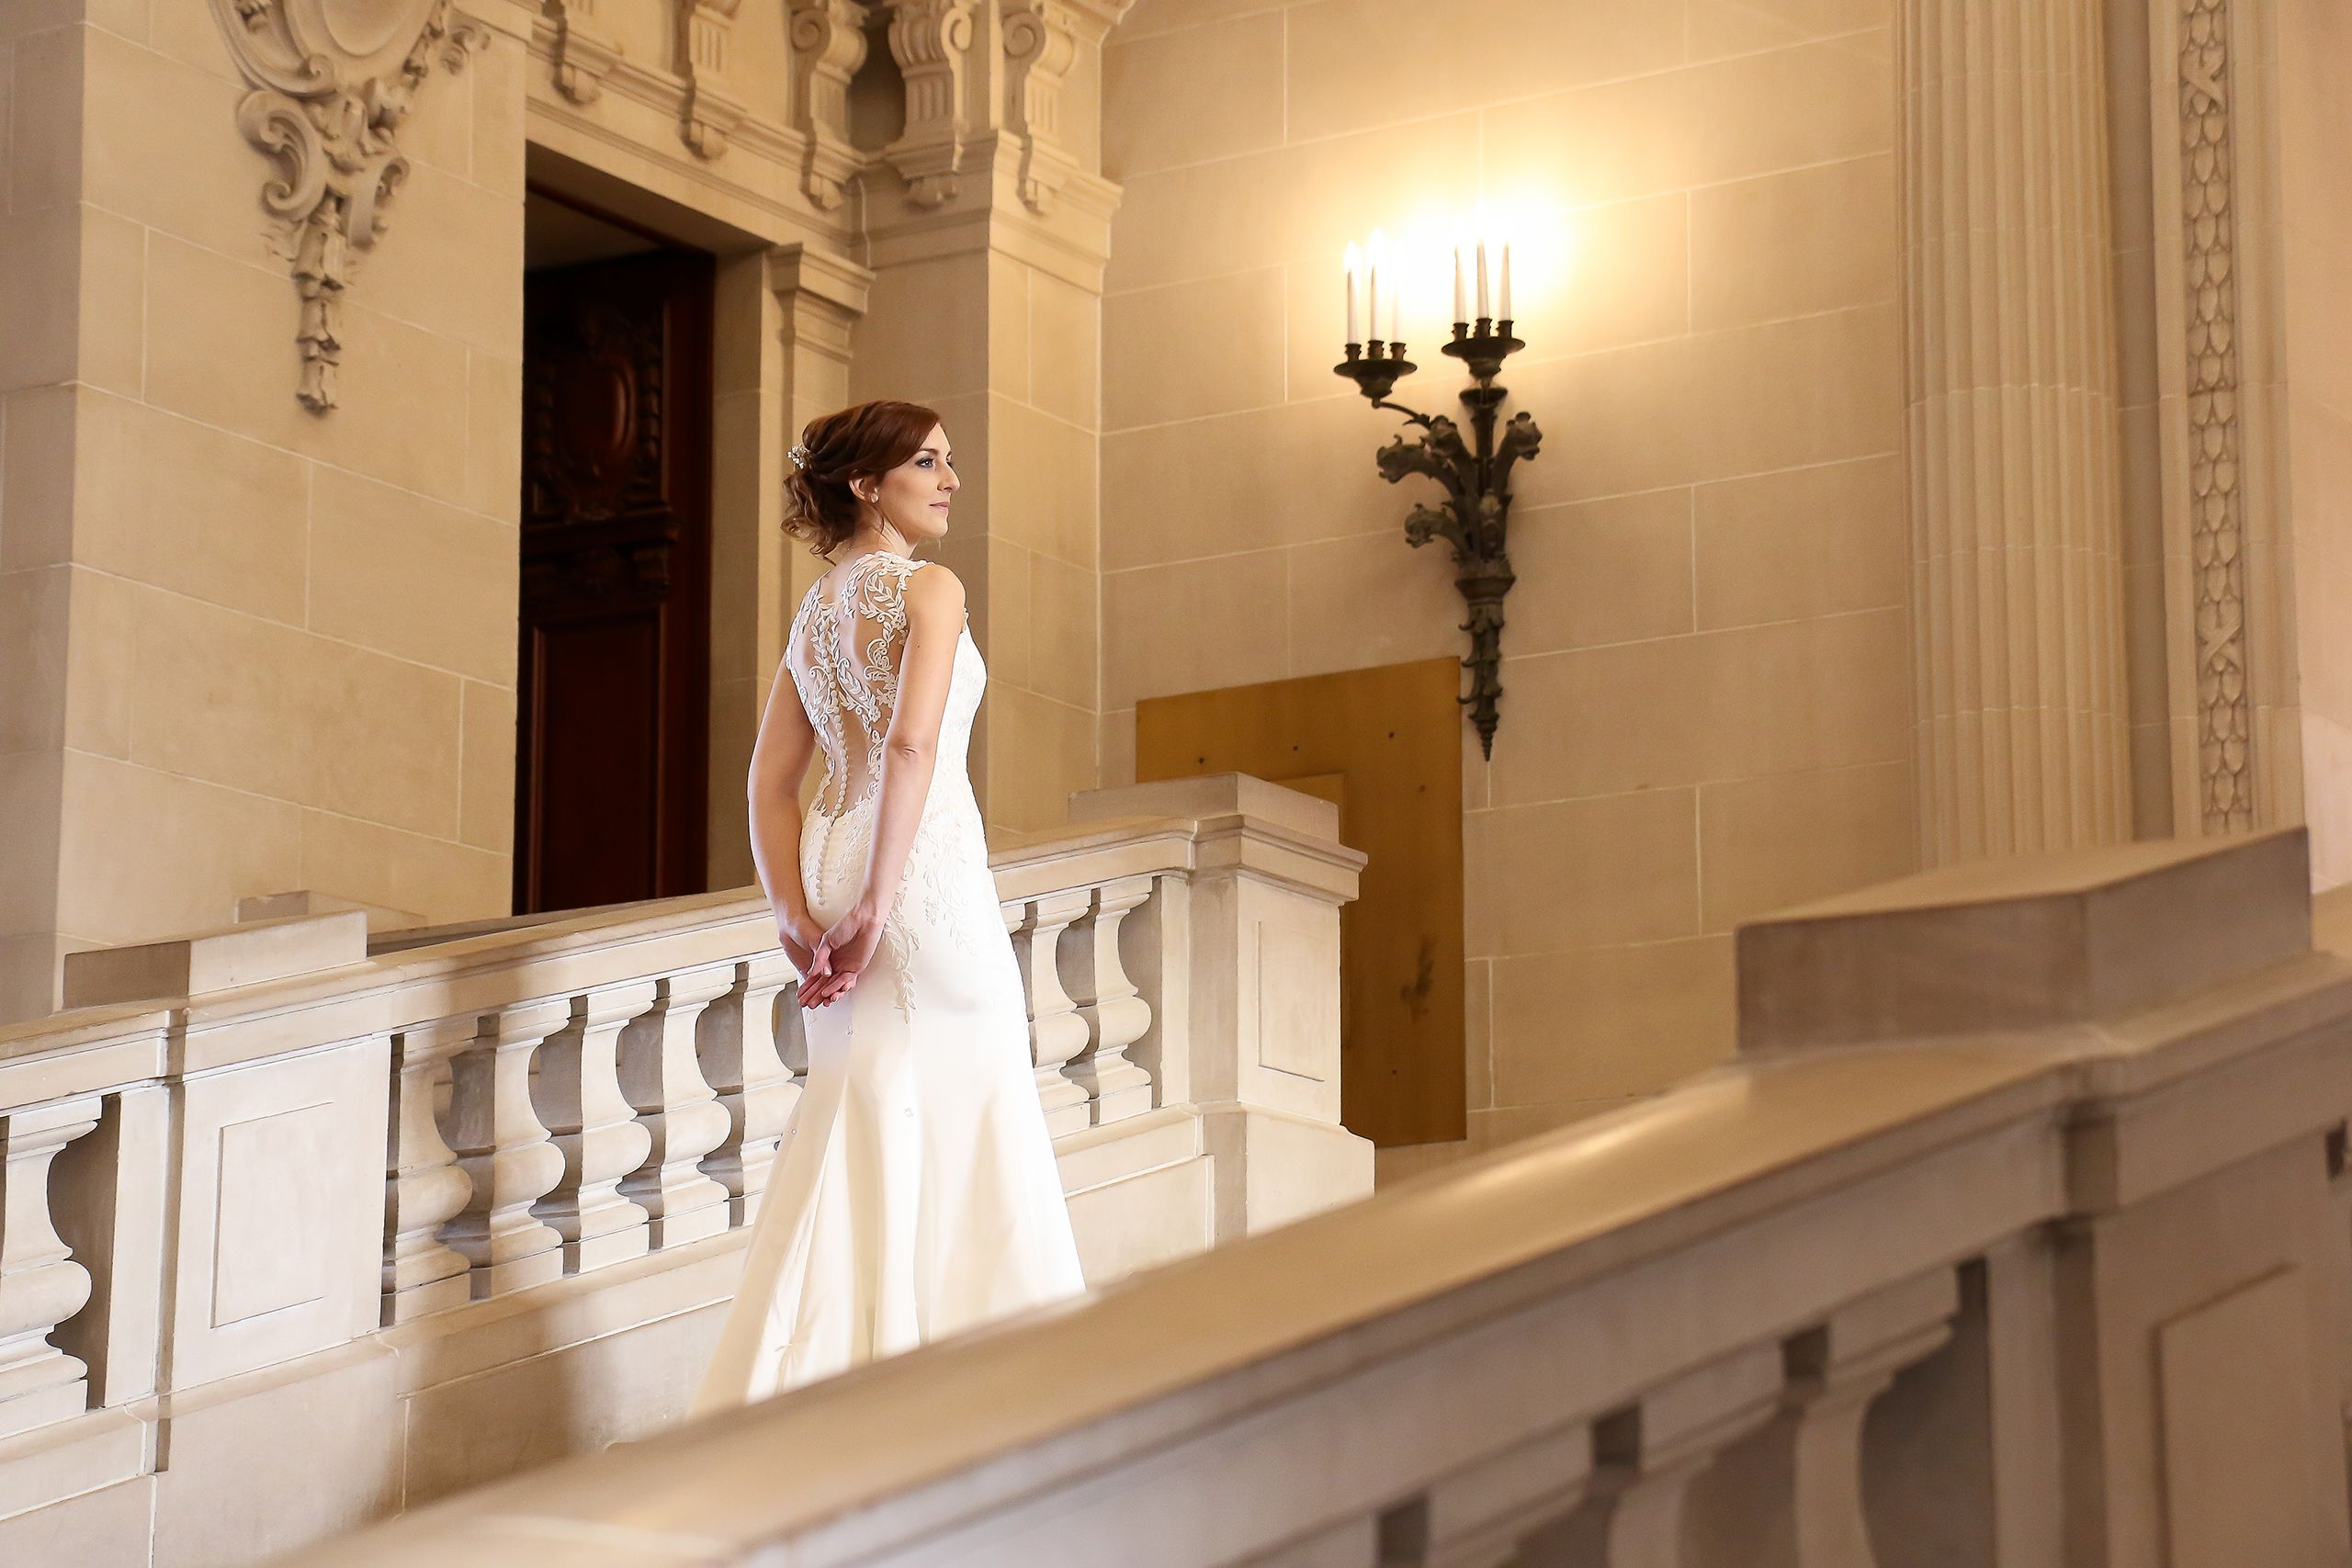 Bride-41.jpg